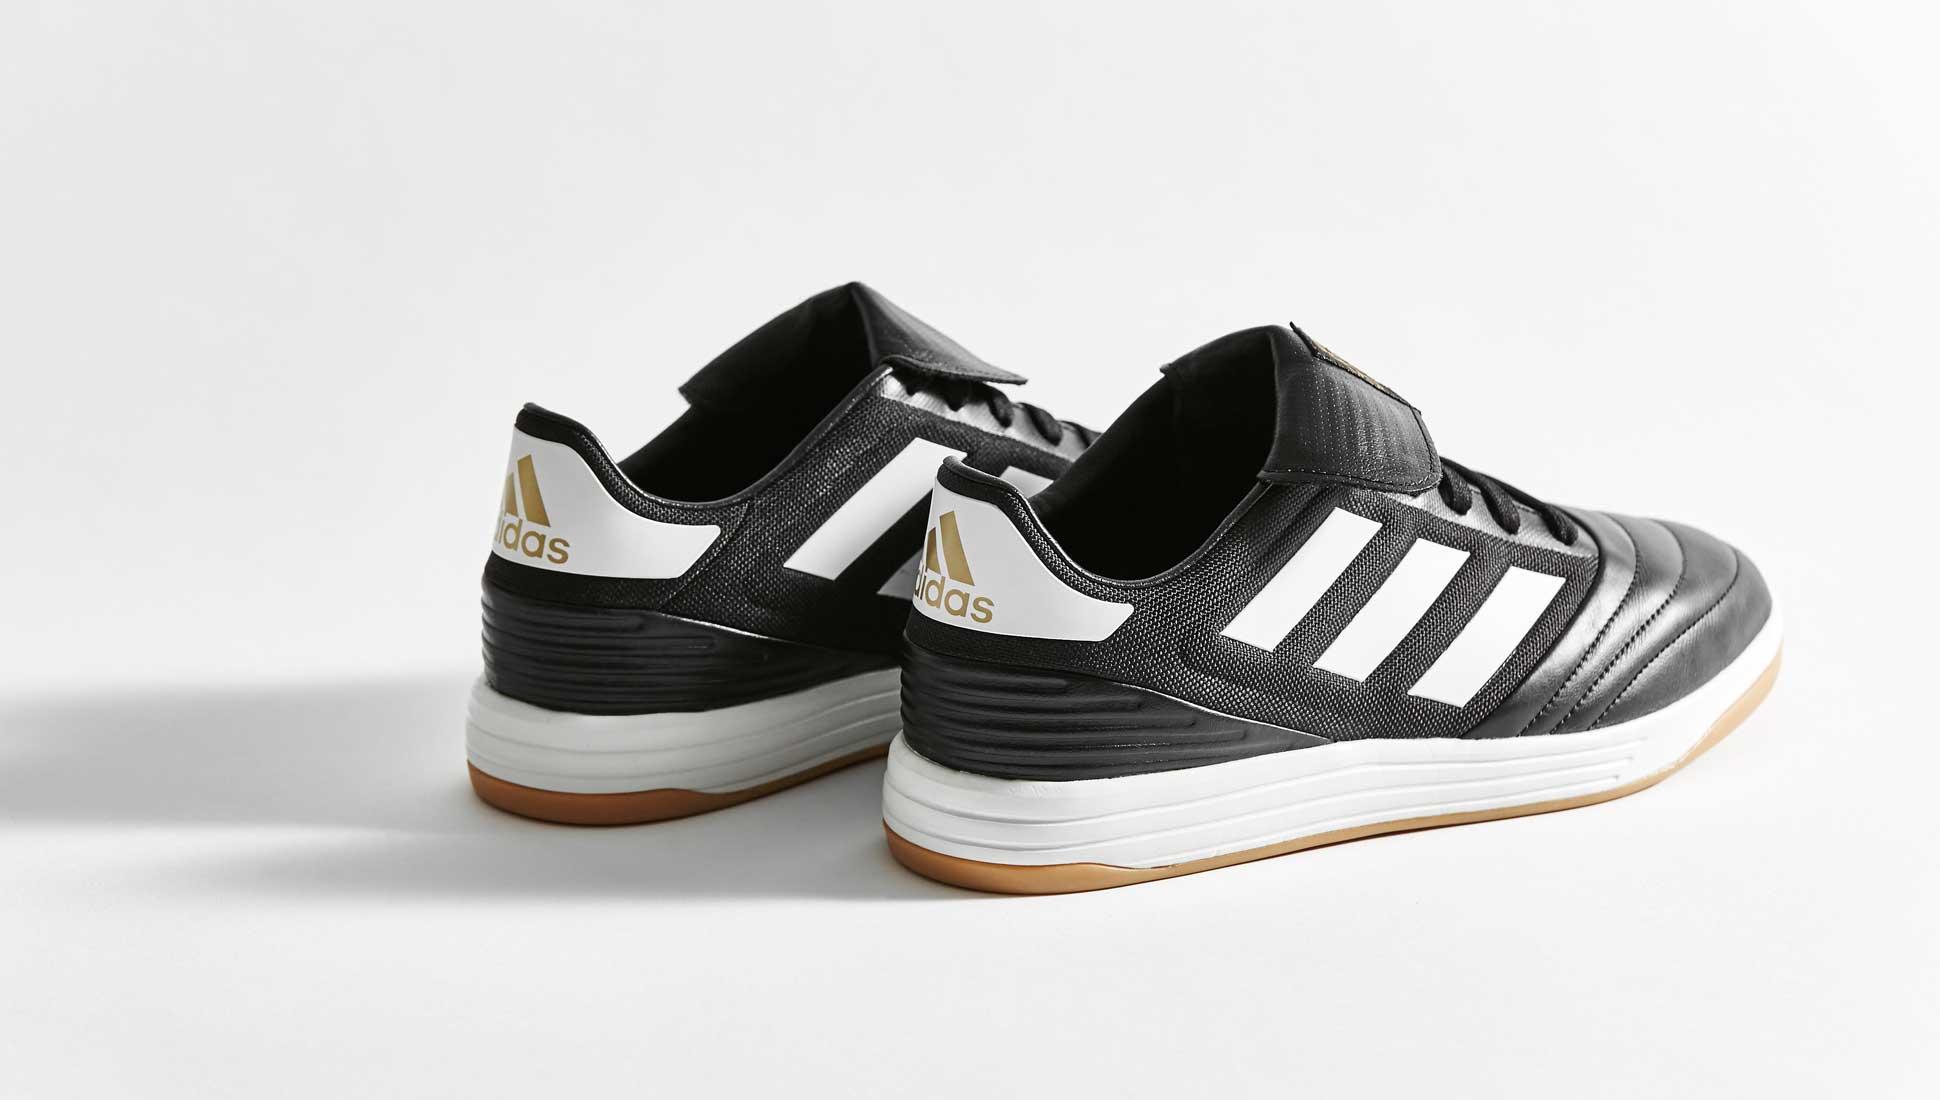 chaussures-football-adidas-copa-tango-17-2-noir-blanc-img3